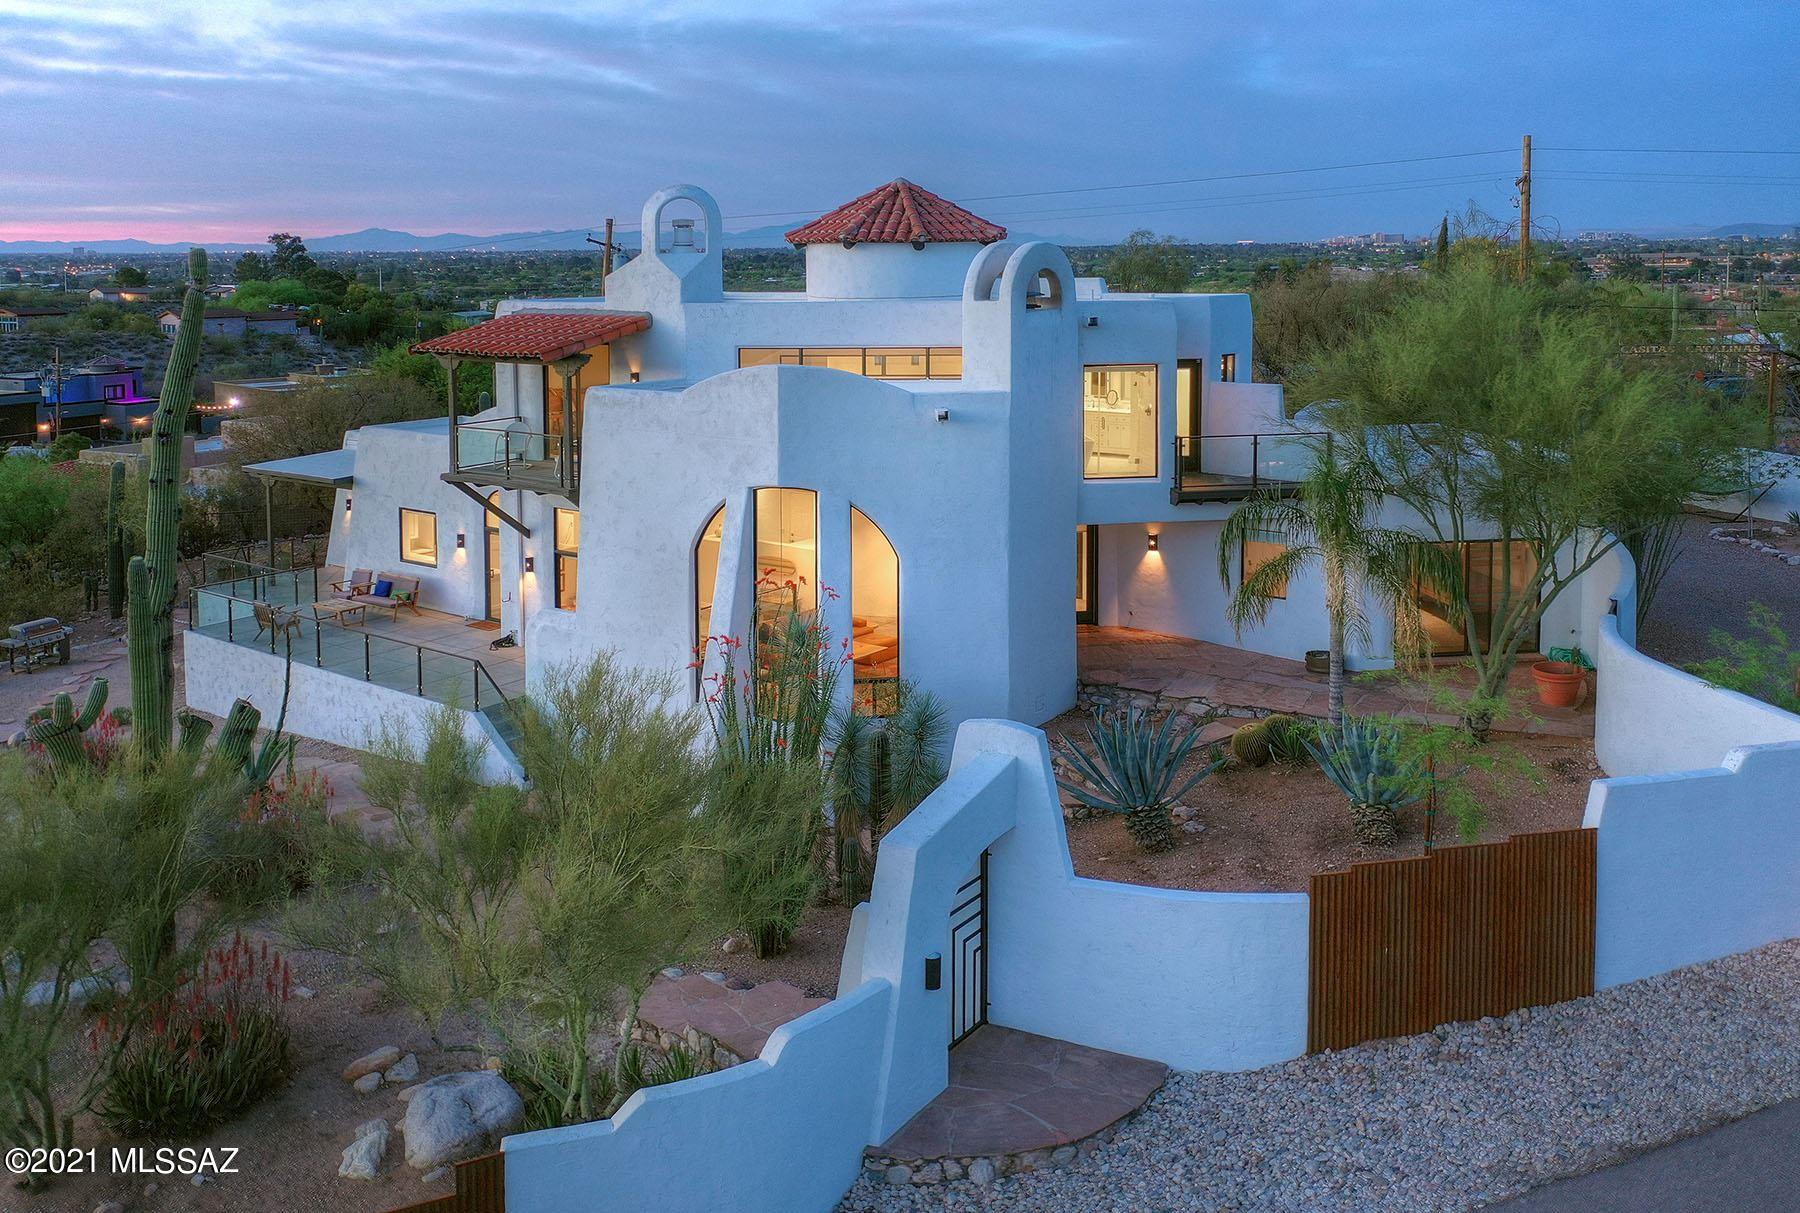 4620 N Caminito Pais, Tucson, AZ 85718 - MLS#: 22119025